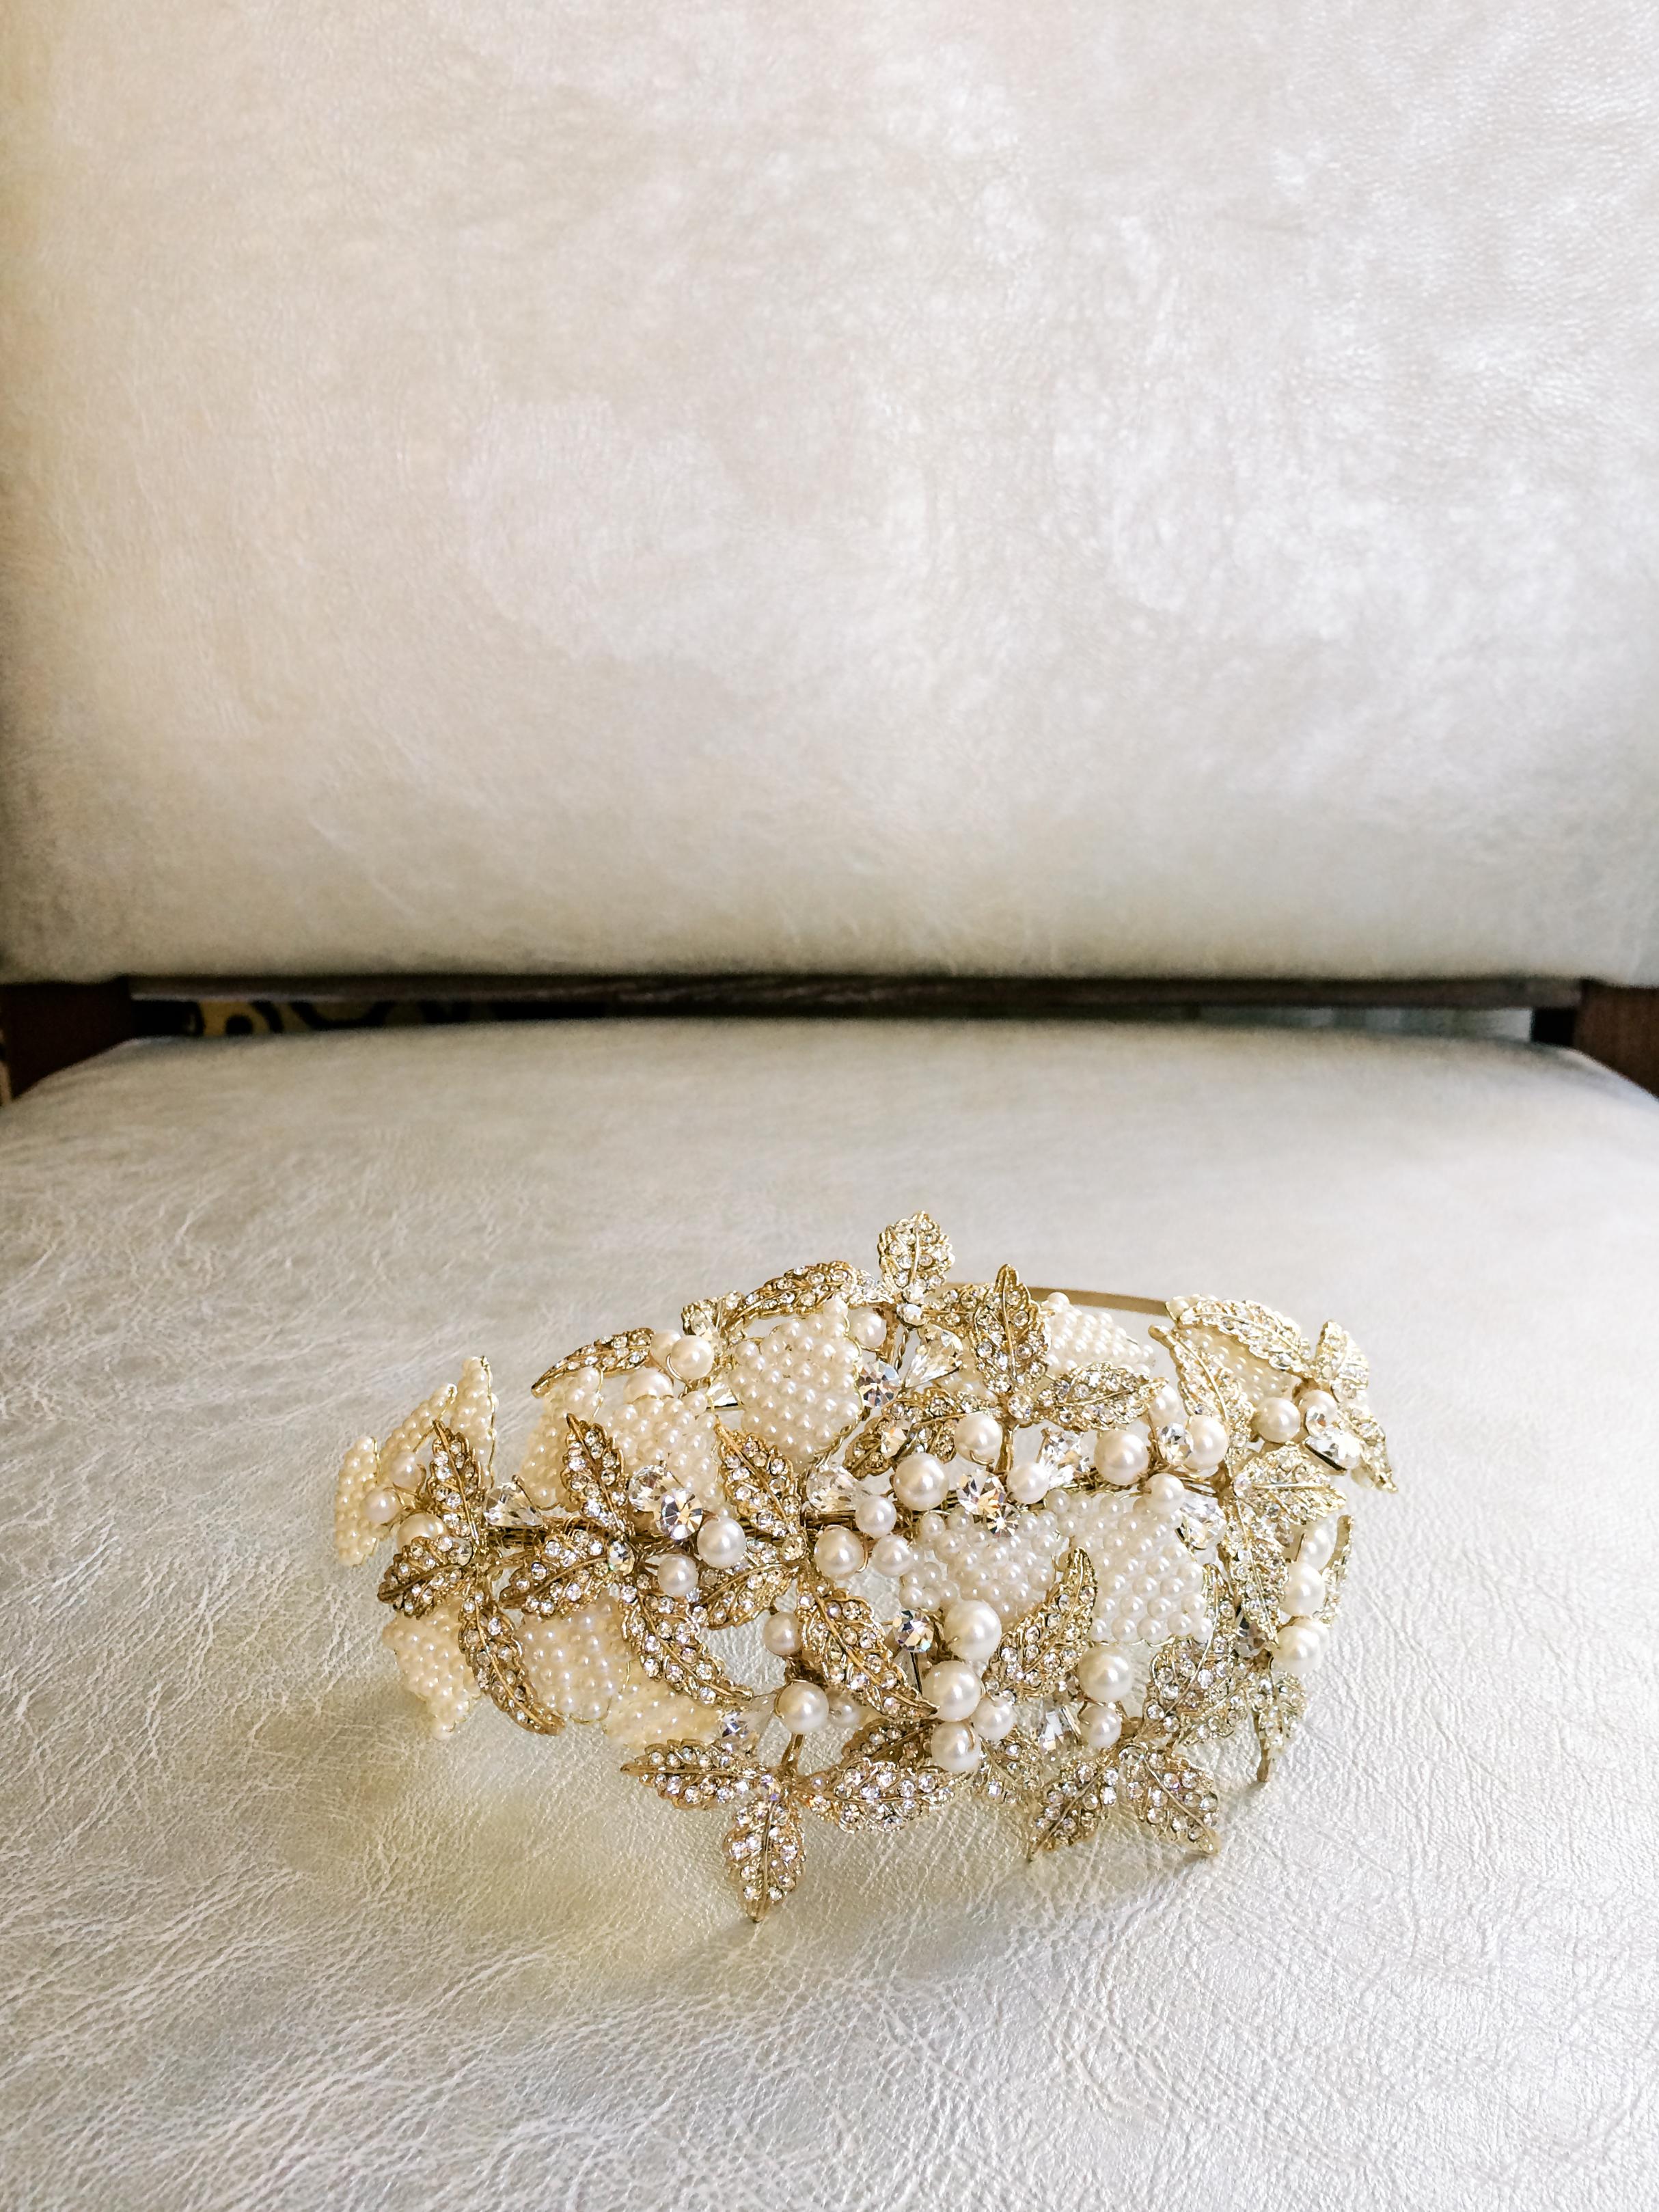 Kelly + Josh   Fall wedding at the Park Hyatt Beaver Creek   Headpiece by Twigs & Honey from Little White Dress   Ash Imagery